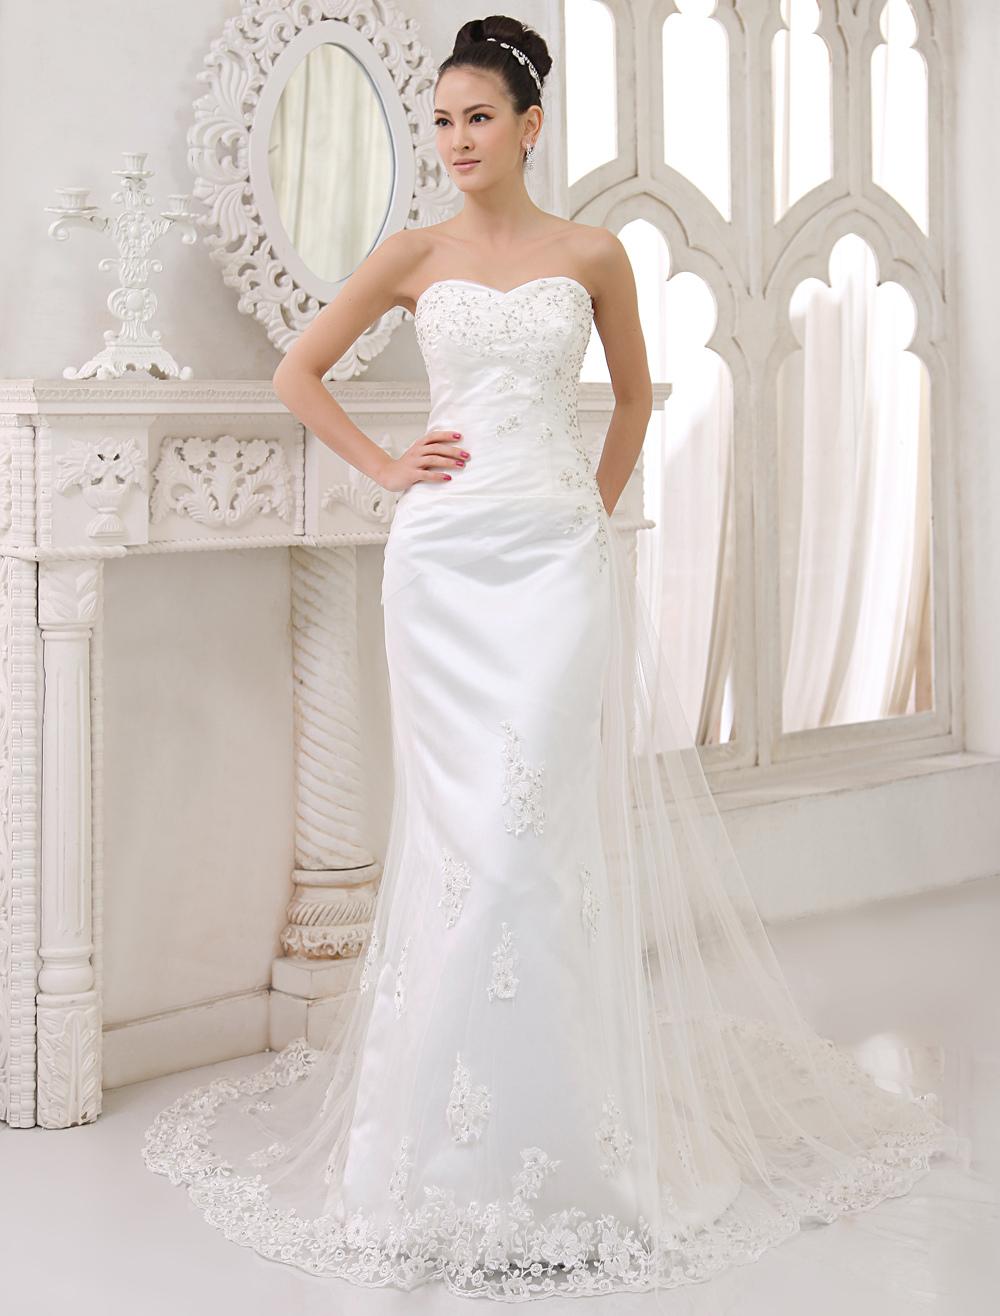 Sweep Train Wedding Dress With Sheath Sweetheart Amp Applique